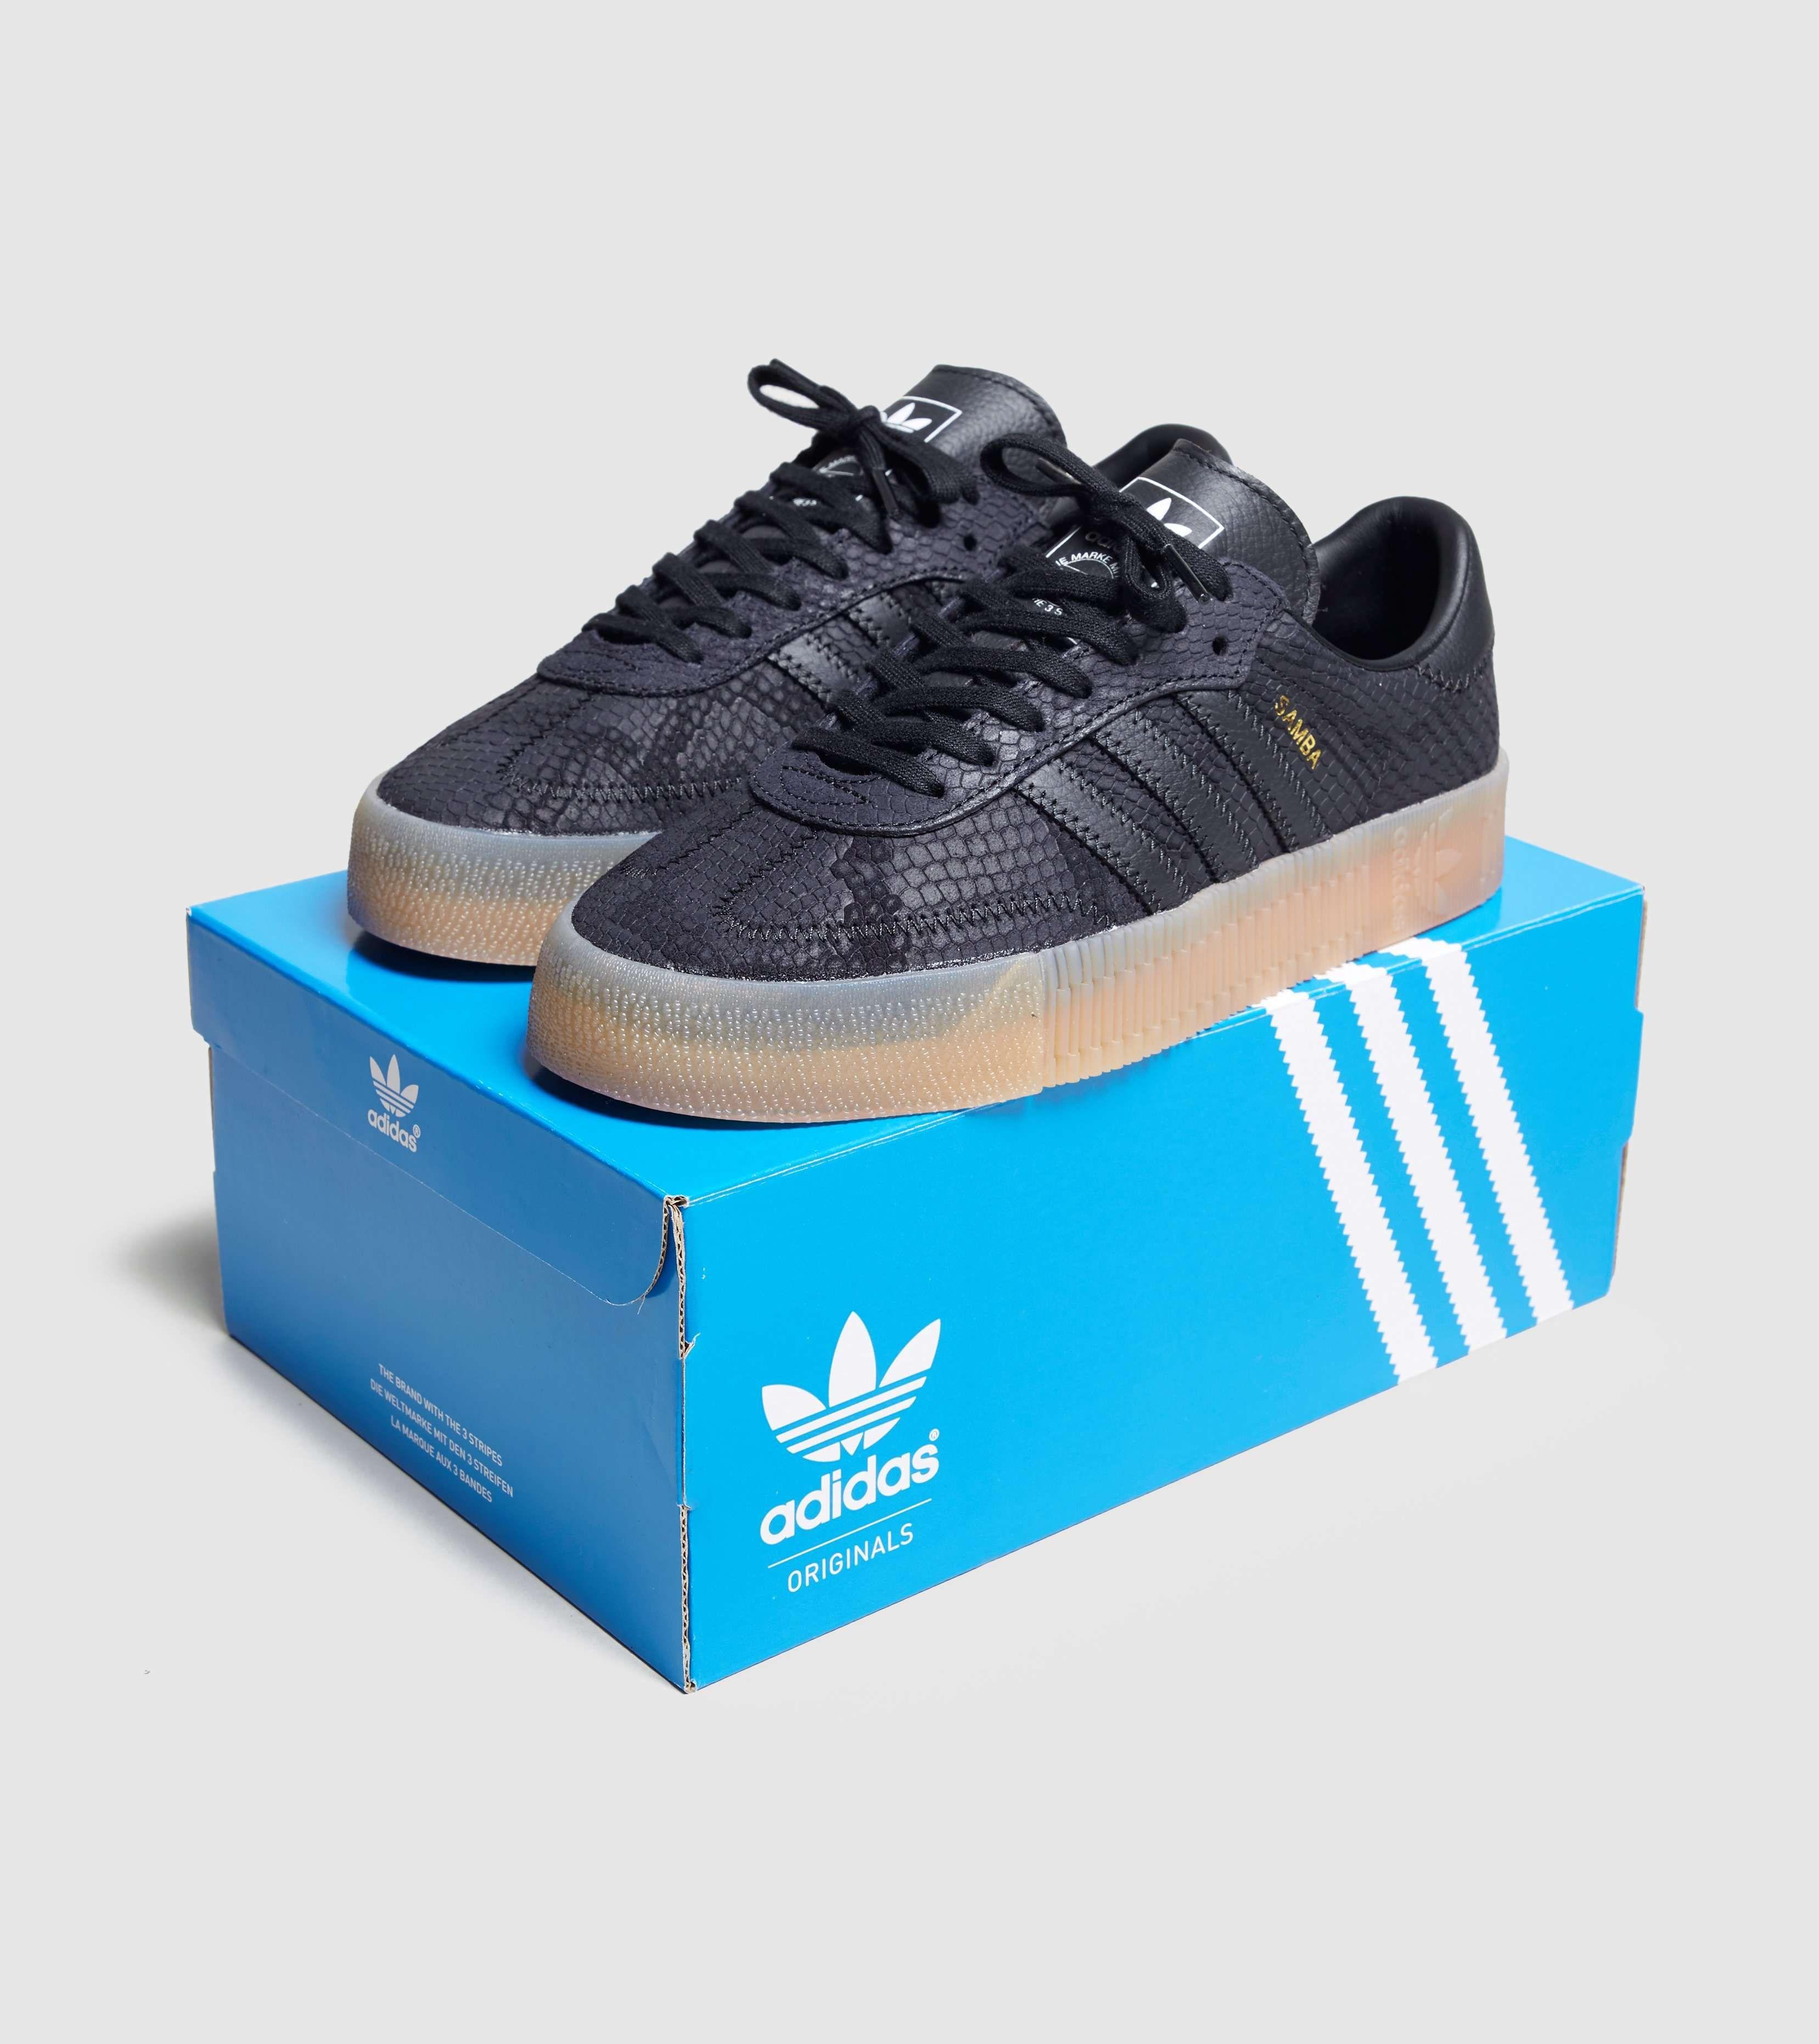 1389f86a402 adidas Originals Samba Rose Women's in 2019   style   Adidas, Black ...